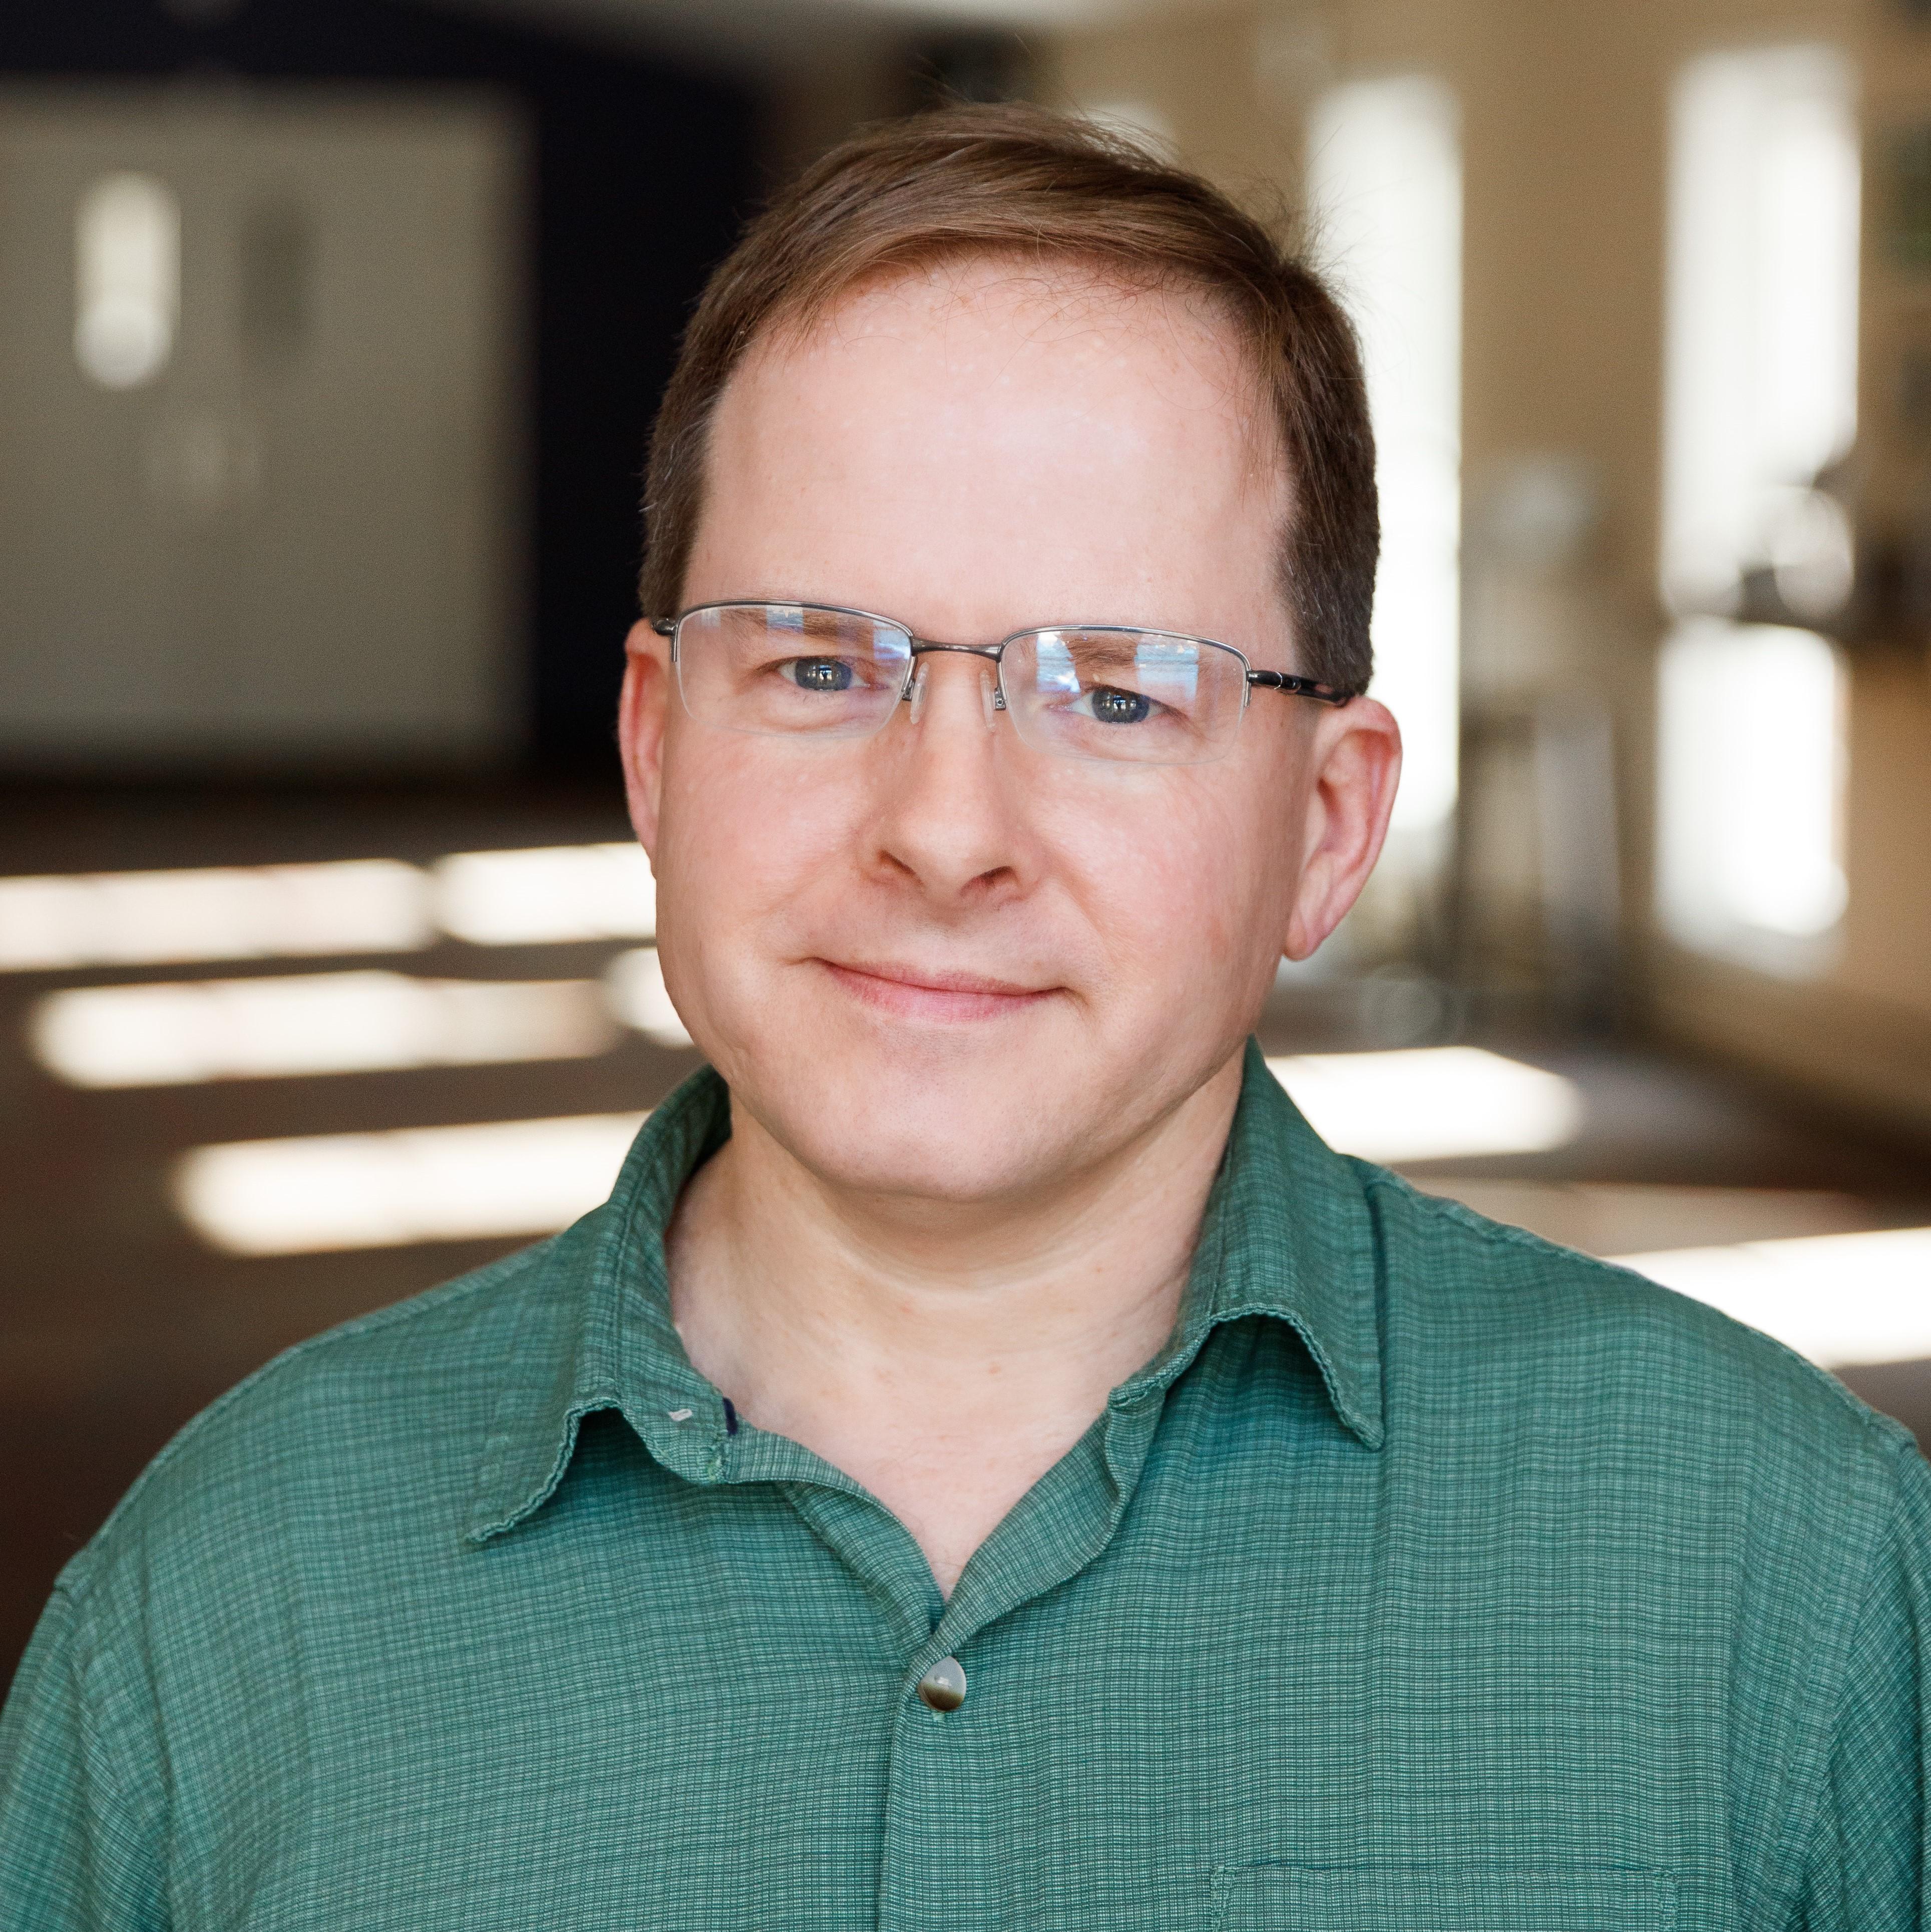 Tony Progar, our Tech Coordinator.